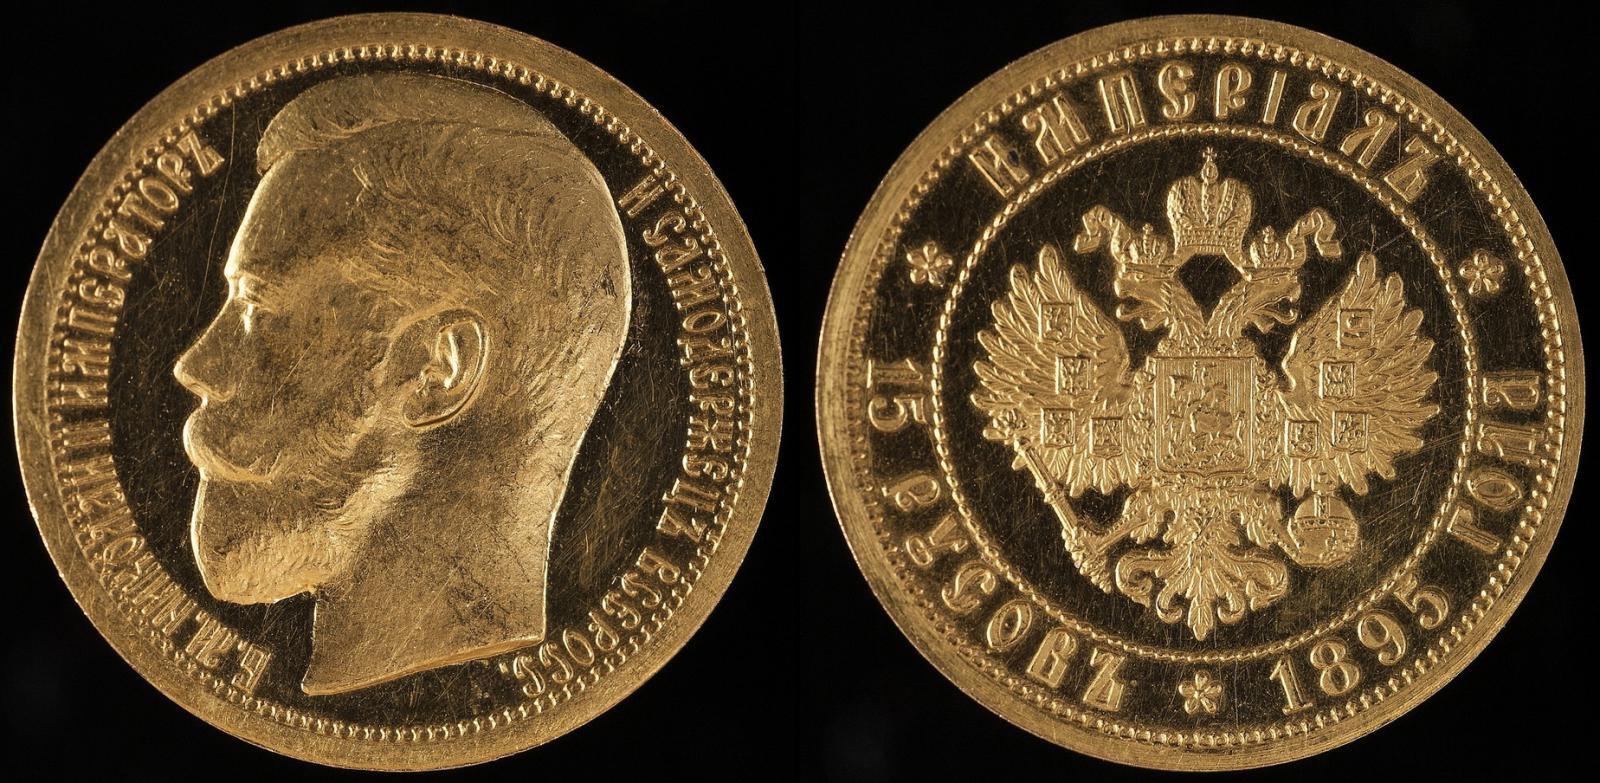 1895 15 rusov or imperial in gold.jpg